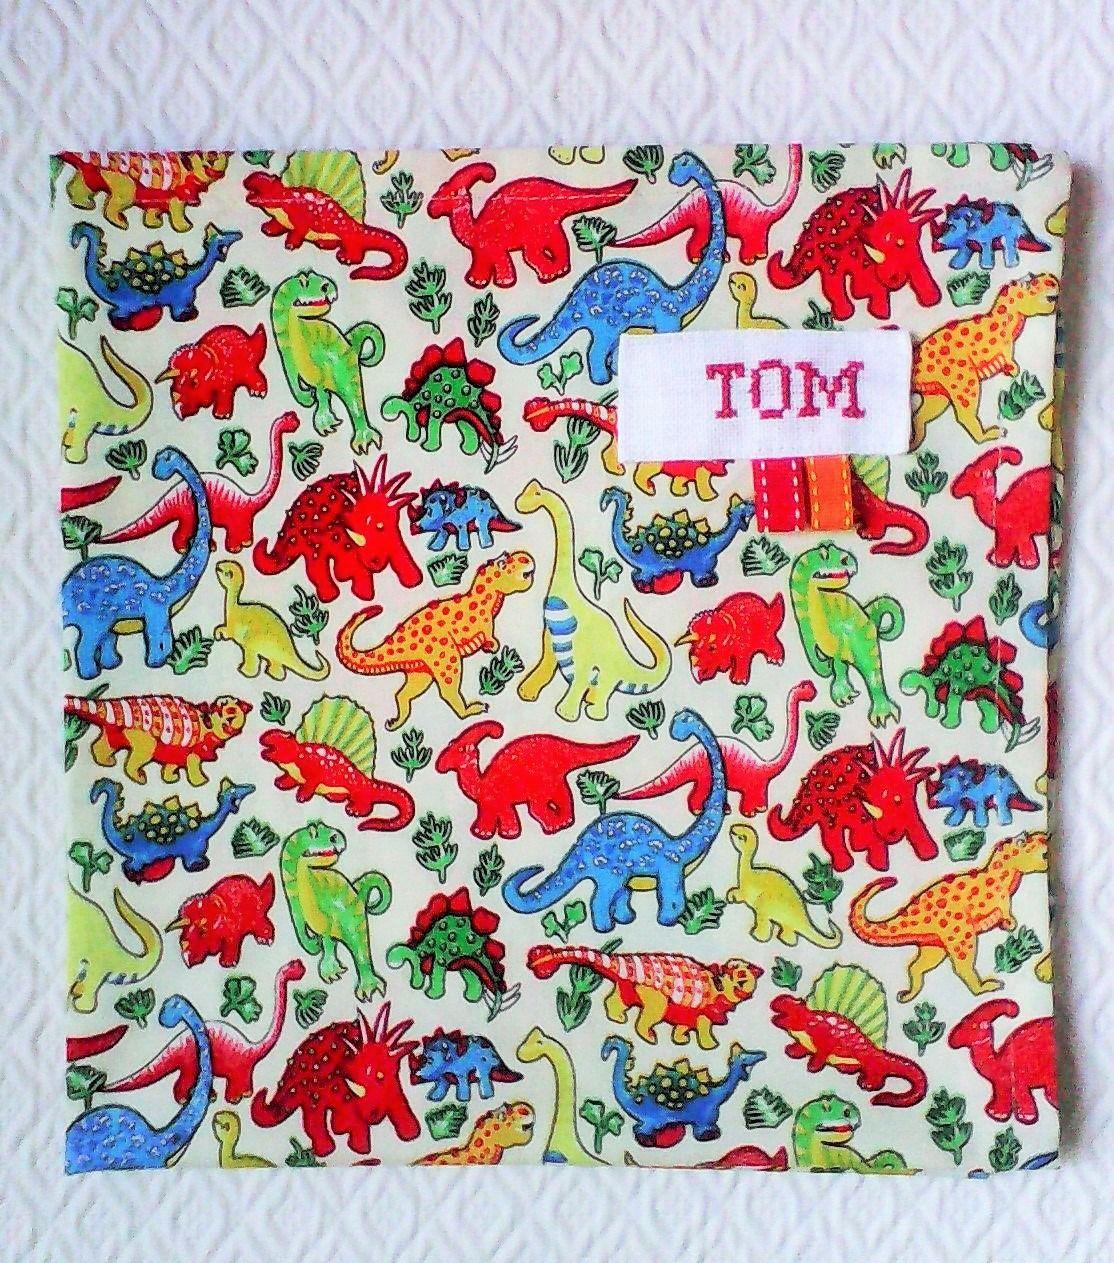 Serviette De Table Enfant No8 Personnalisable Tissu De Coton Petits Dinausores Multicolores Ecole Et Loisirs Serviette De Table Table Enfant Dinausore